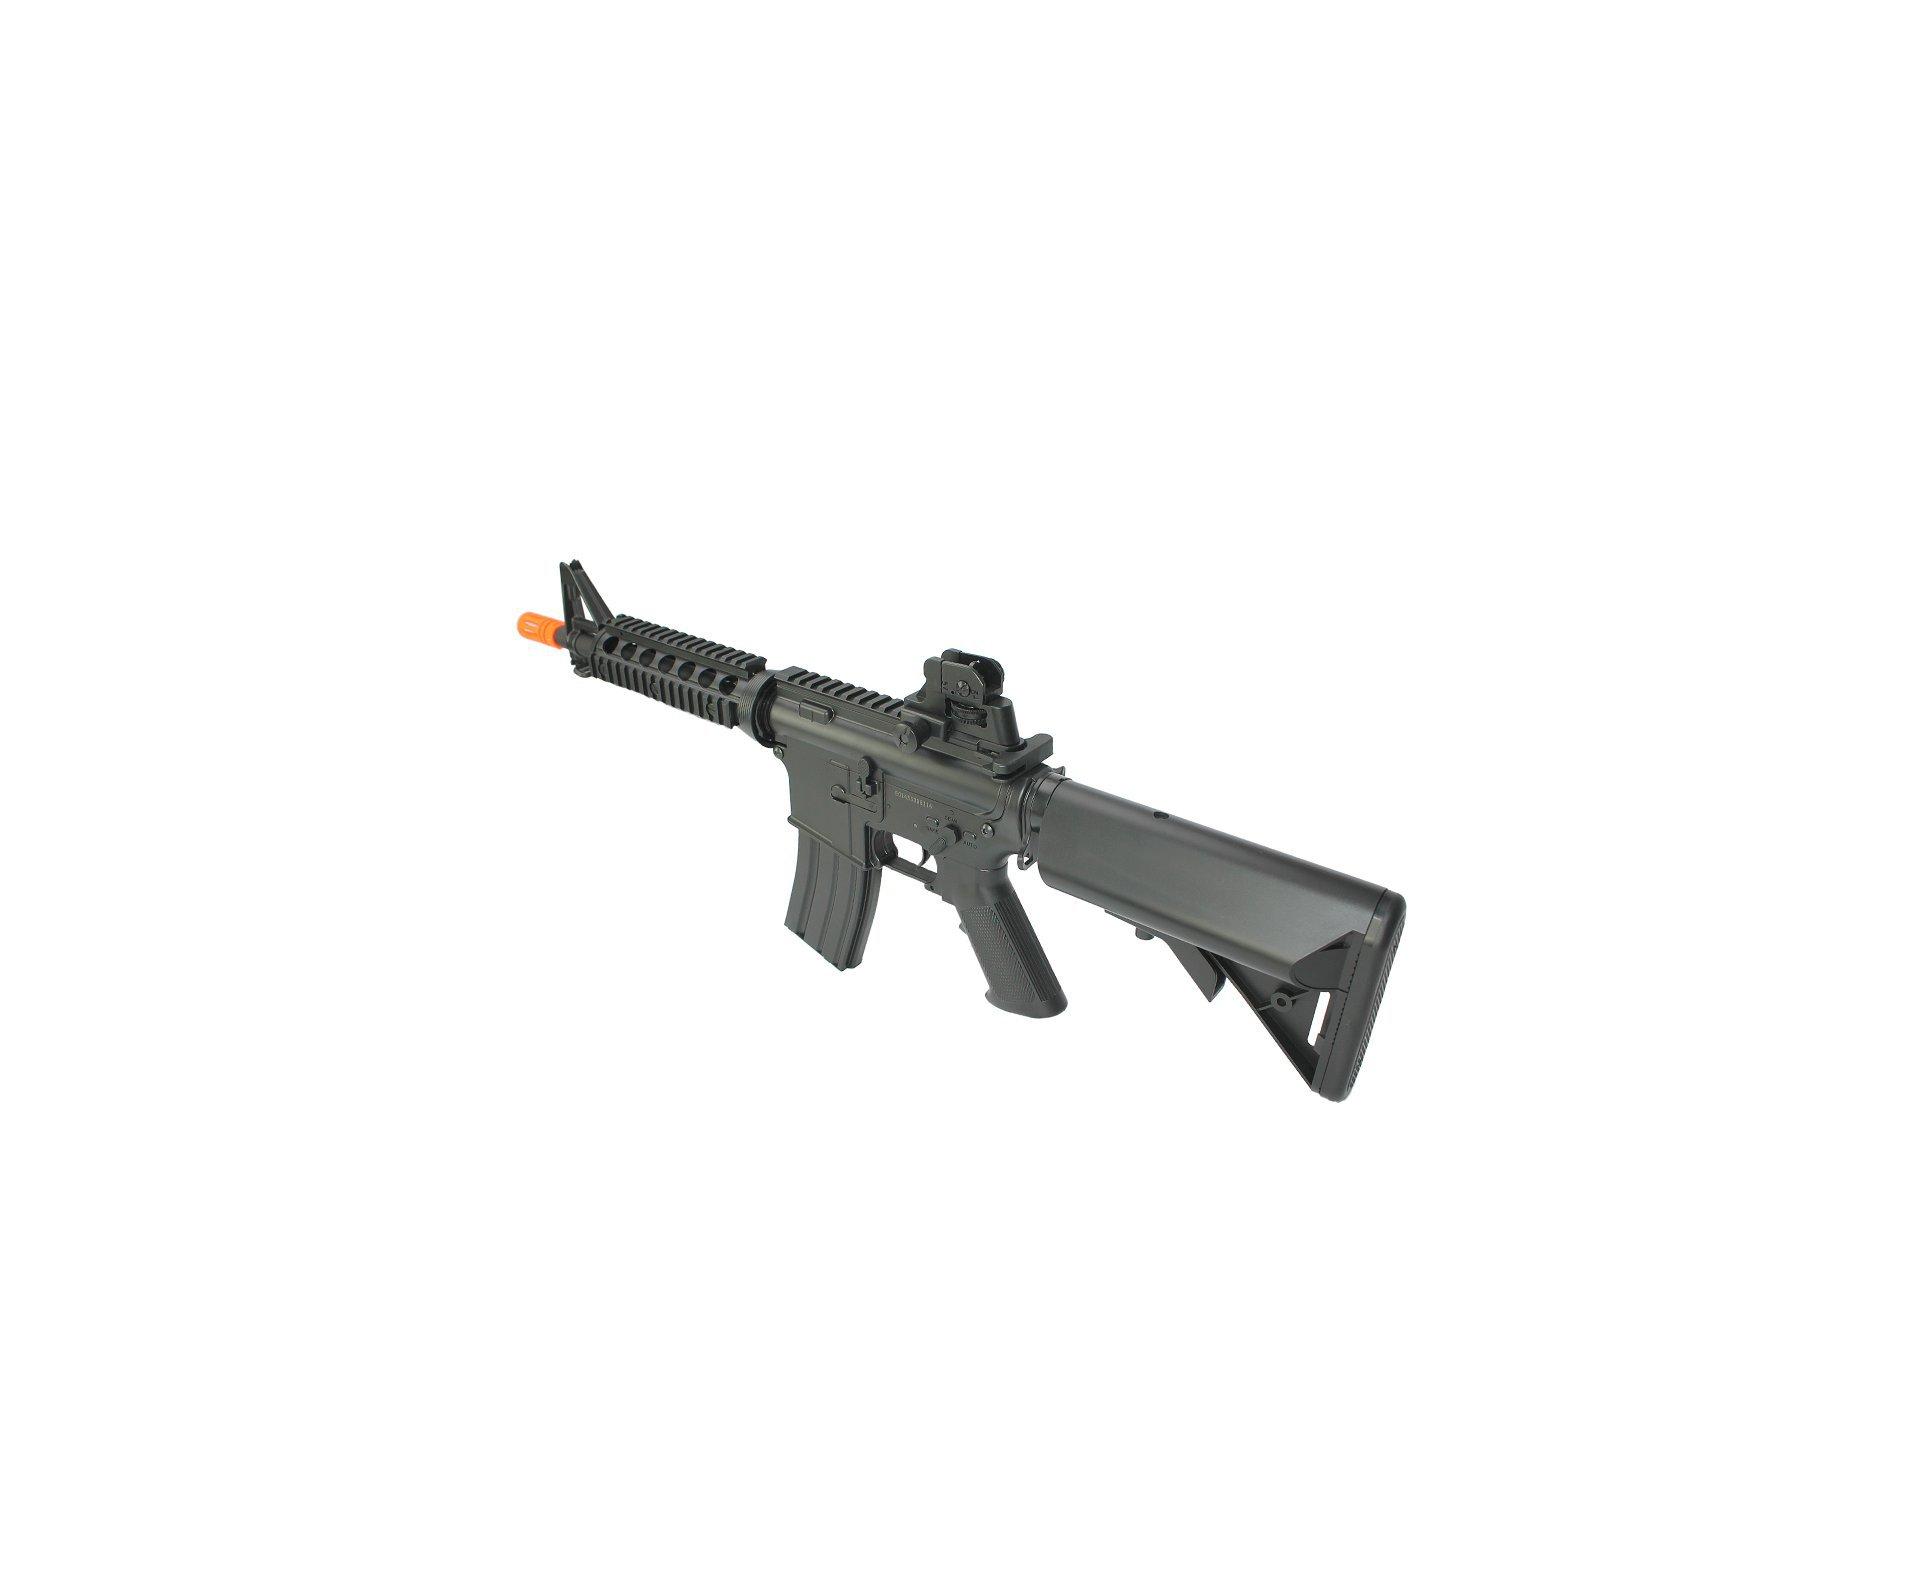 Rifle De Airsoft M4a1 Cqb Ris Cm506 Cal 6mm - Eletrico Bivolt - Cyma + Red Dot 1x22 + 4000 Esferas 0,20g + Capa